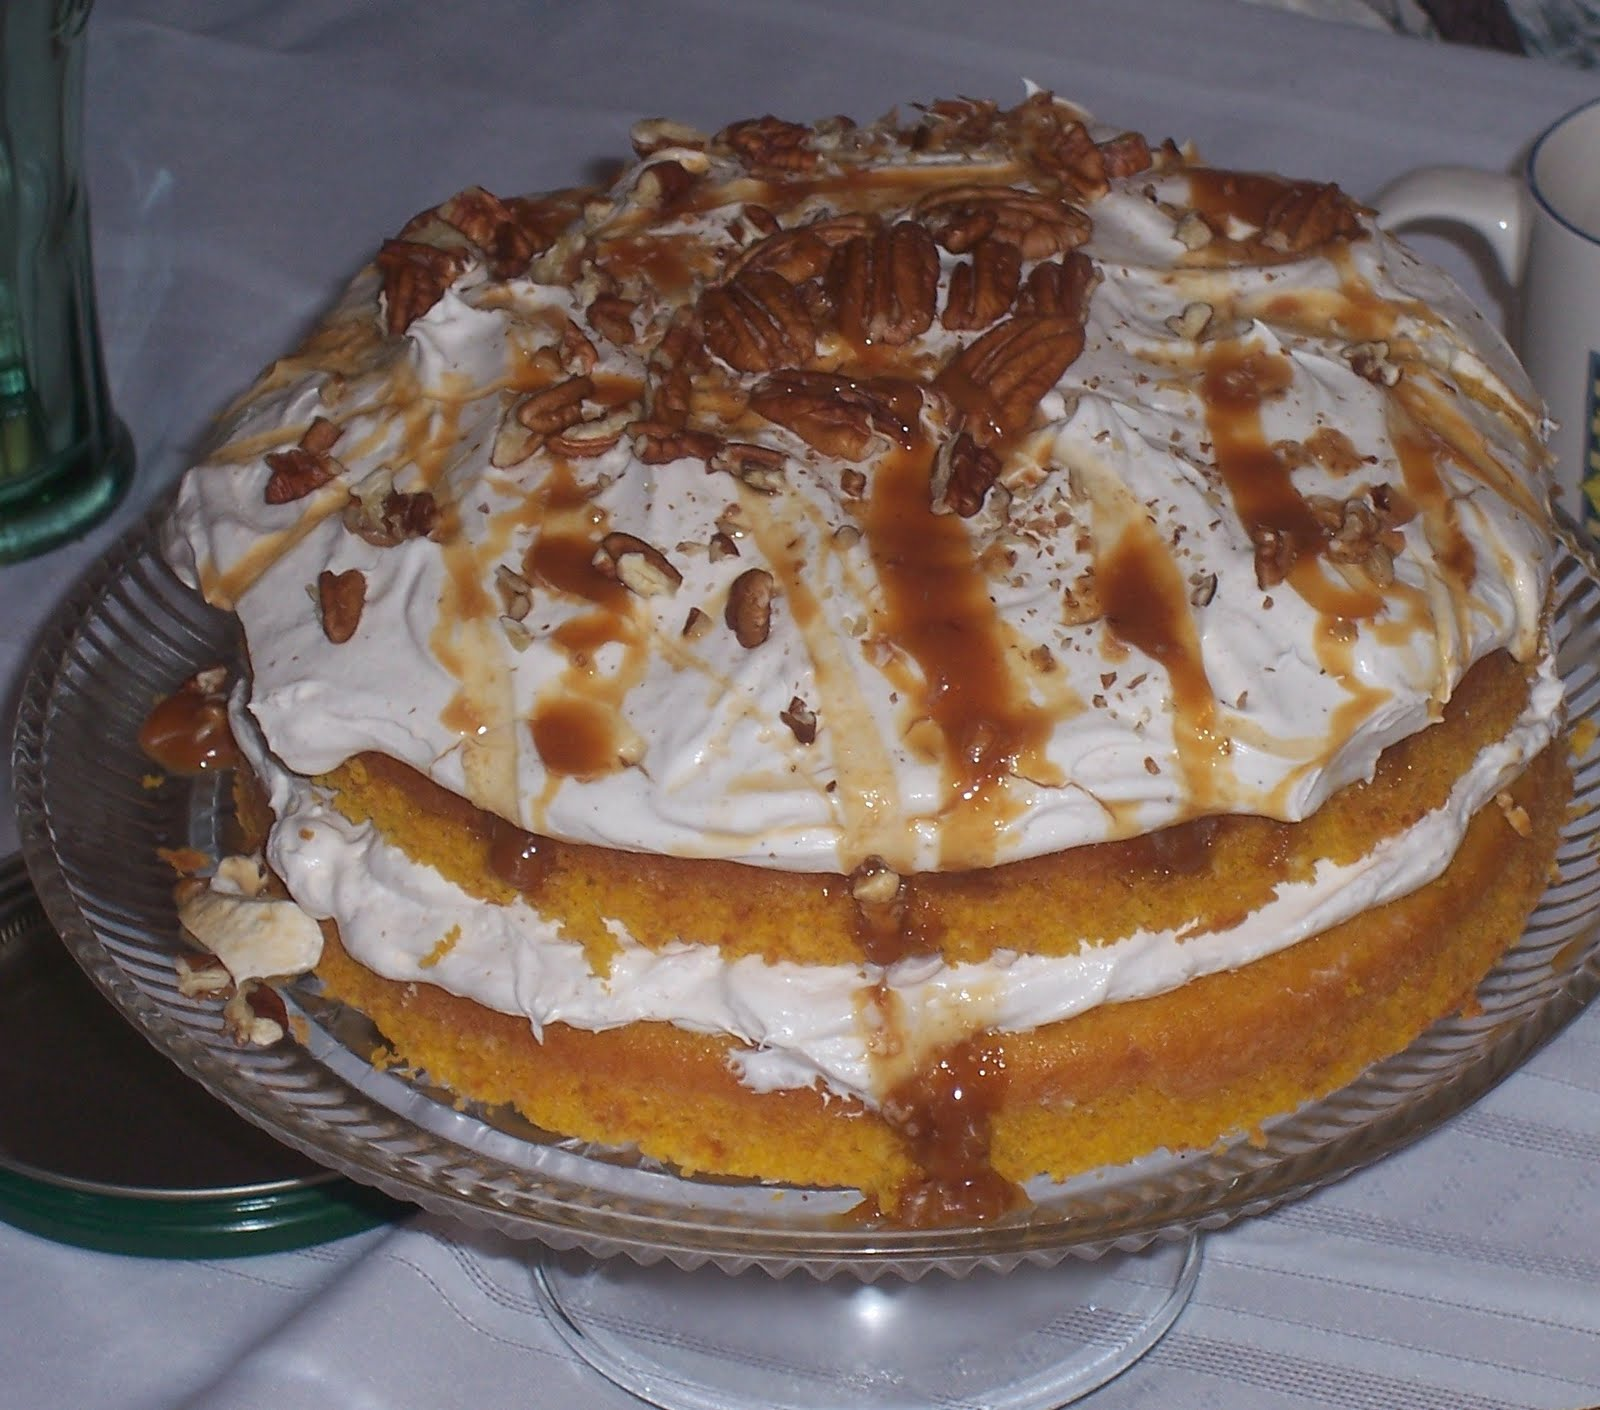 http://4.bp.blogspot.com/_C_cTZnnSp90/TJJmW09oVCI/AAAAAAAAA0Y/-t8pYnUV6ks/s1600/Cake.JPG